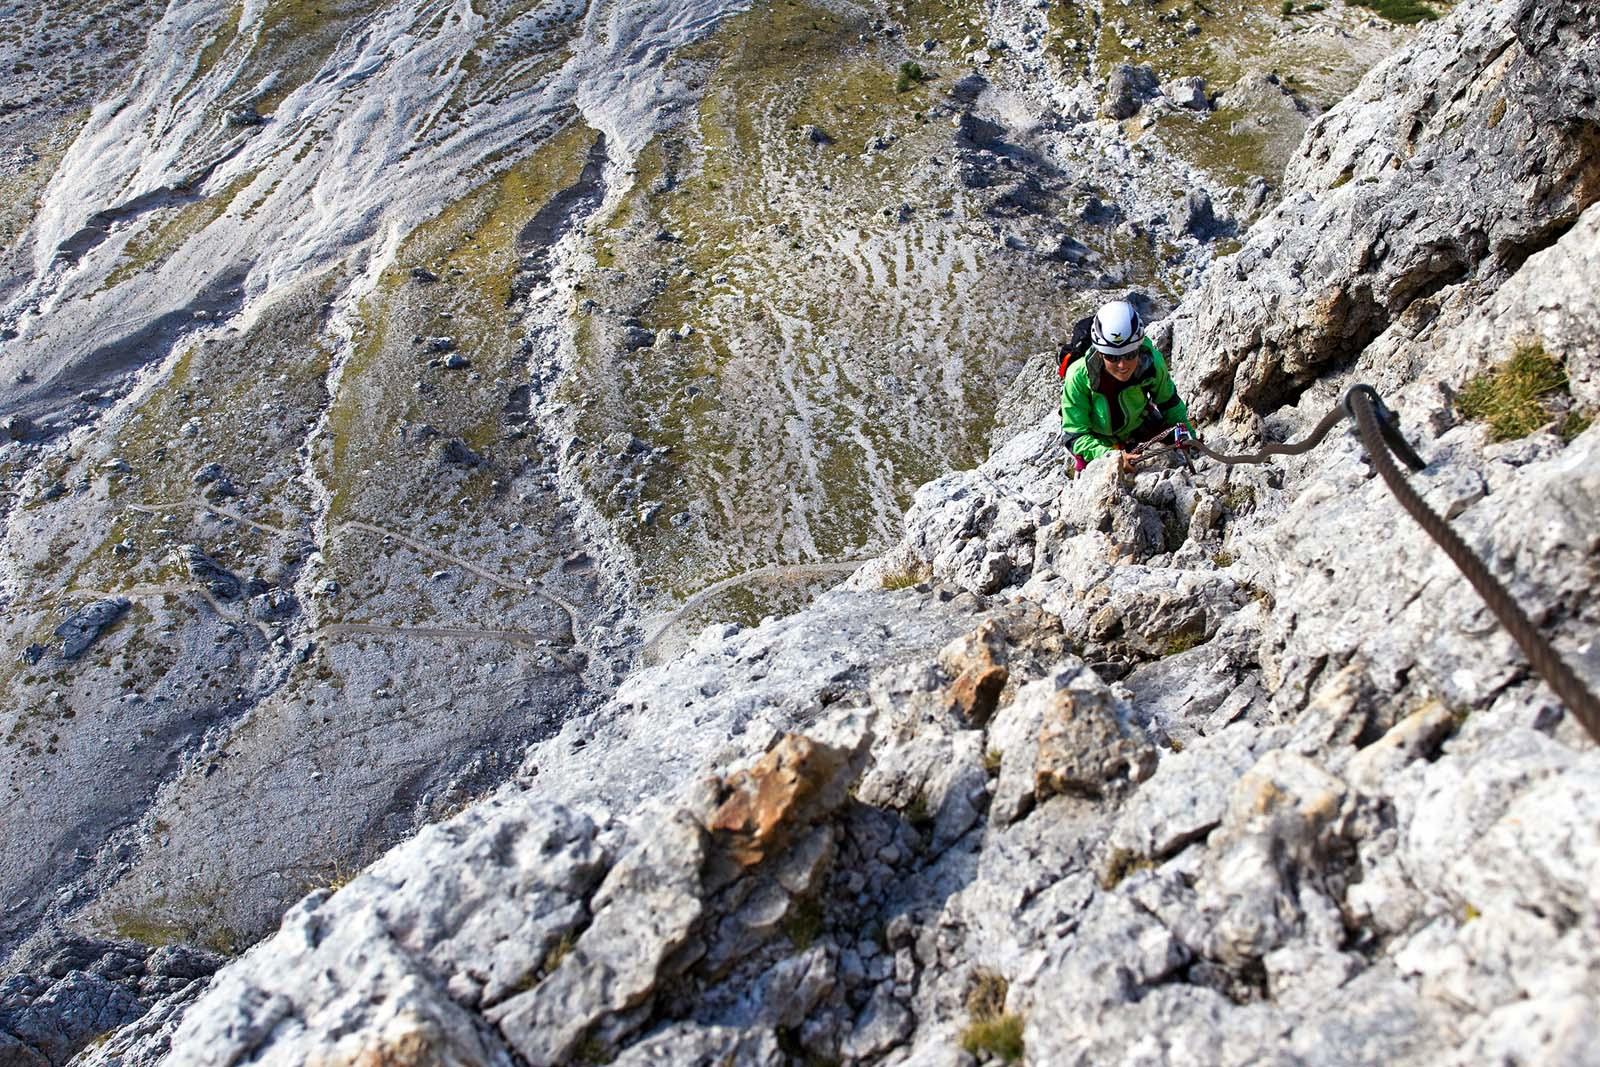 Klettersteig Dolomiten : Klettersteigwoche in den dolomiten sellagruppe